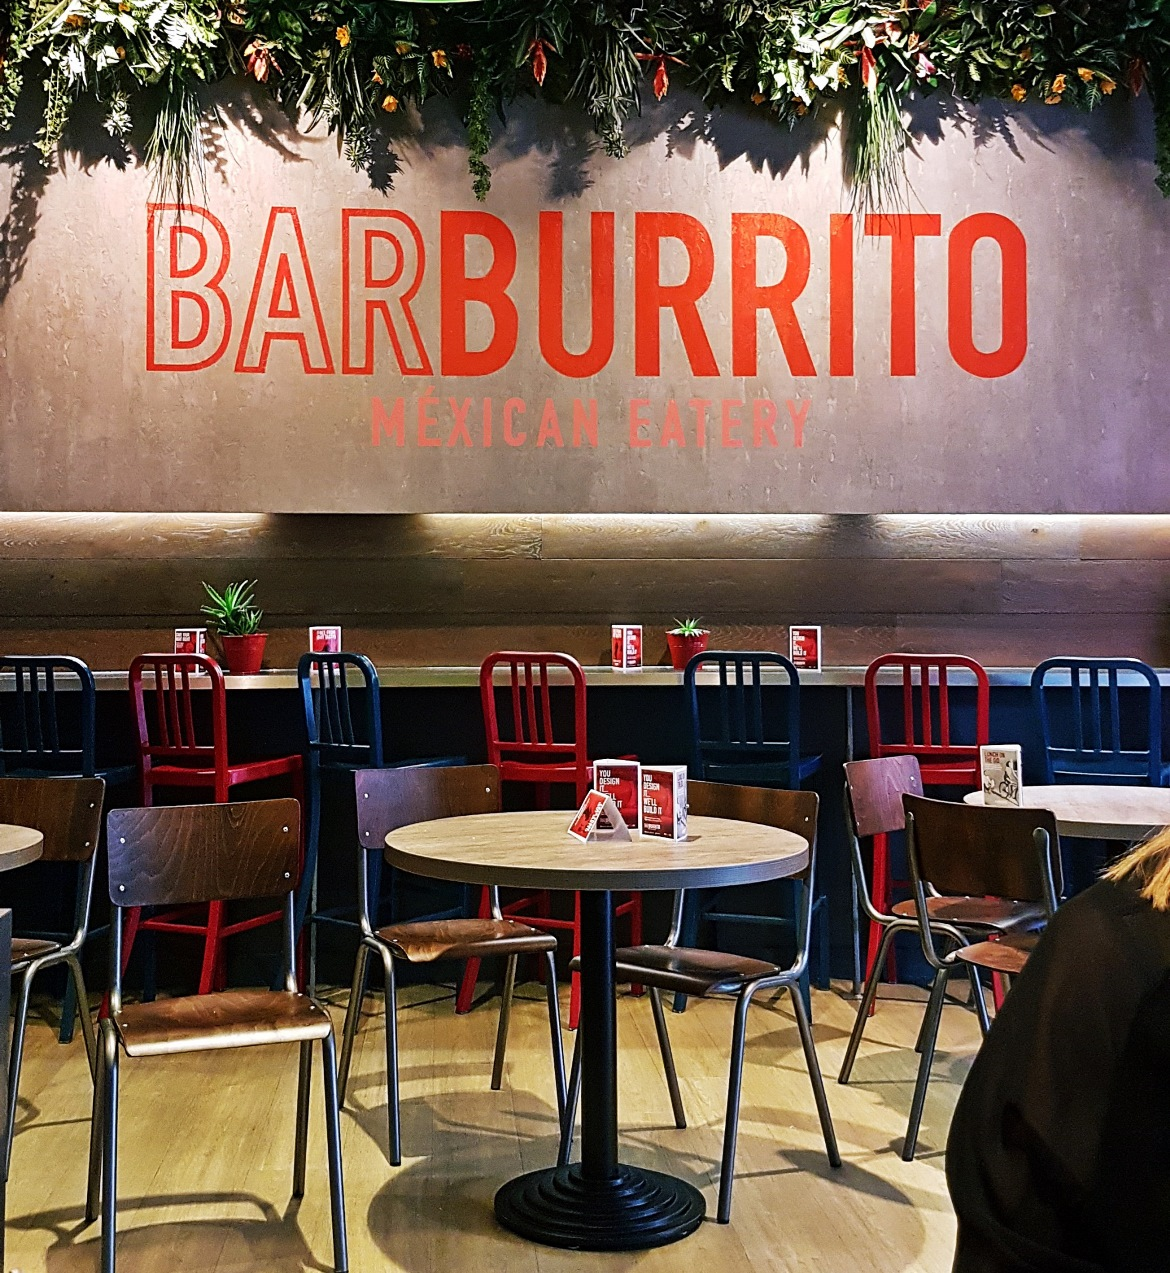 Interior of Barburrito - Burrito Masterclass with Barburrito, review by BeckyBecky Blogs